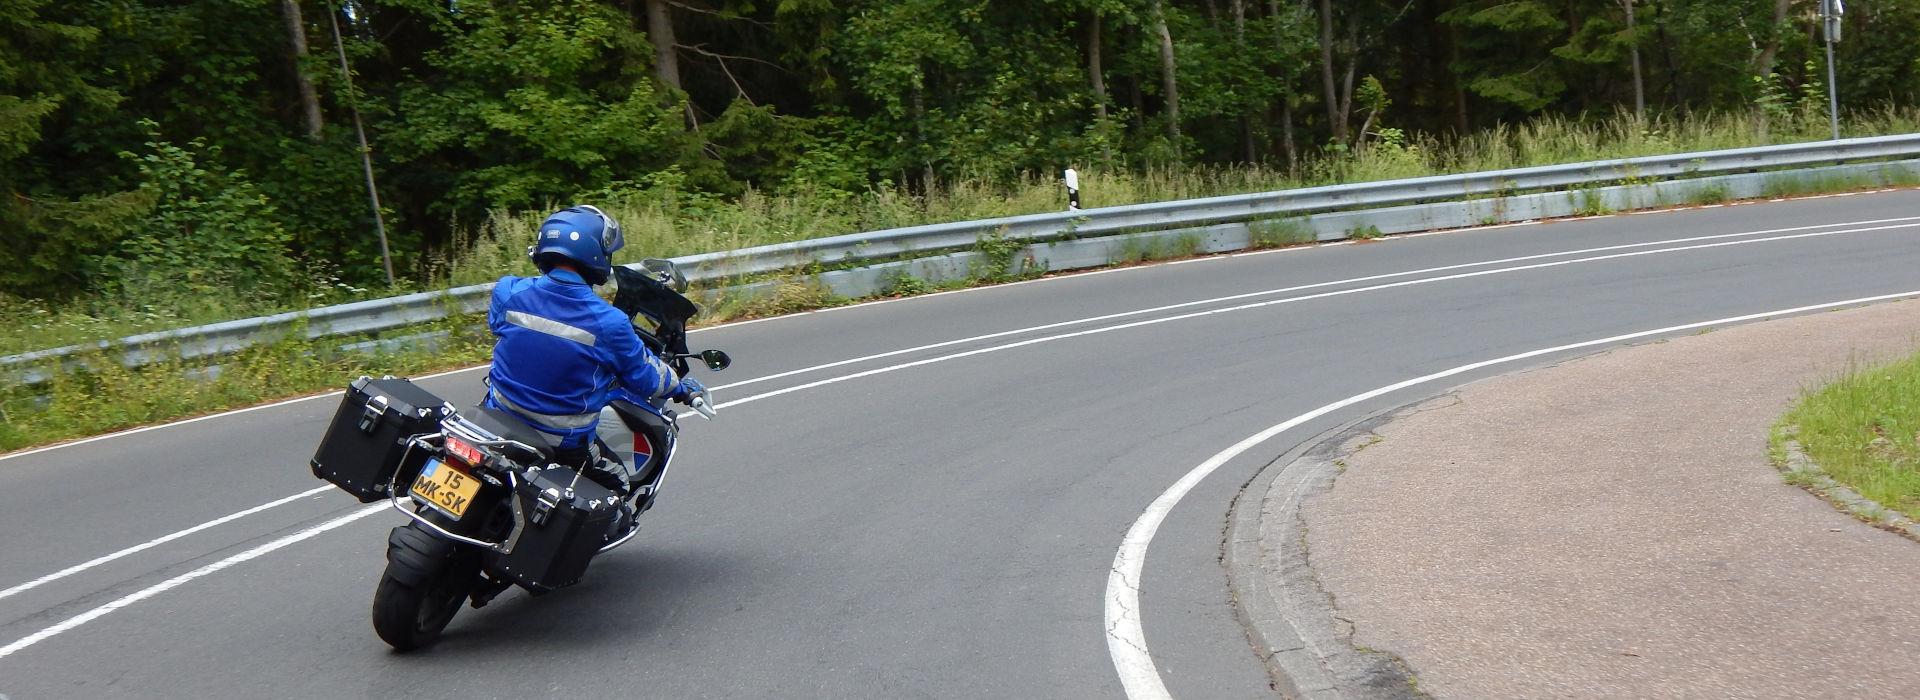 Motorrijbewijspoint Swifterband spoed motorrijbewijs